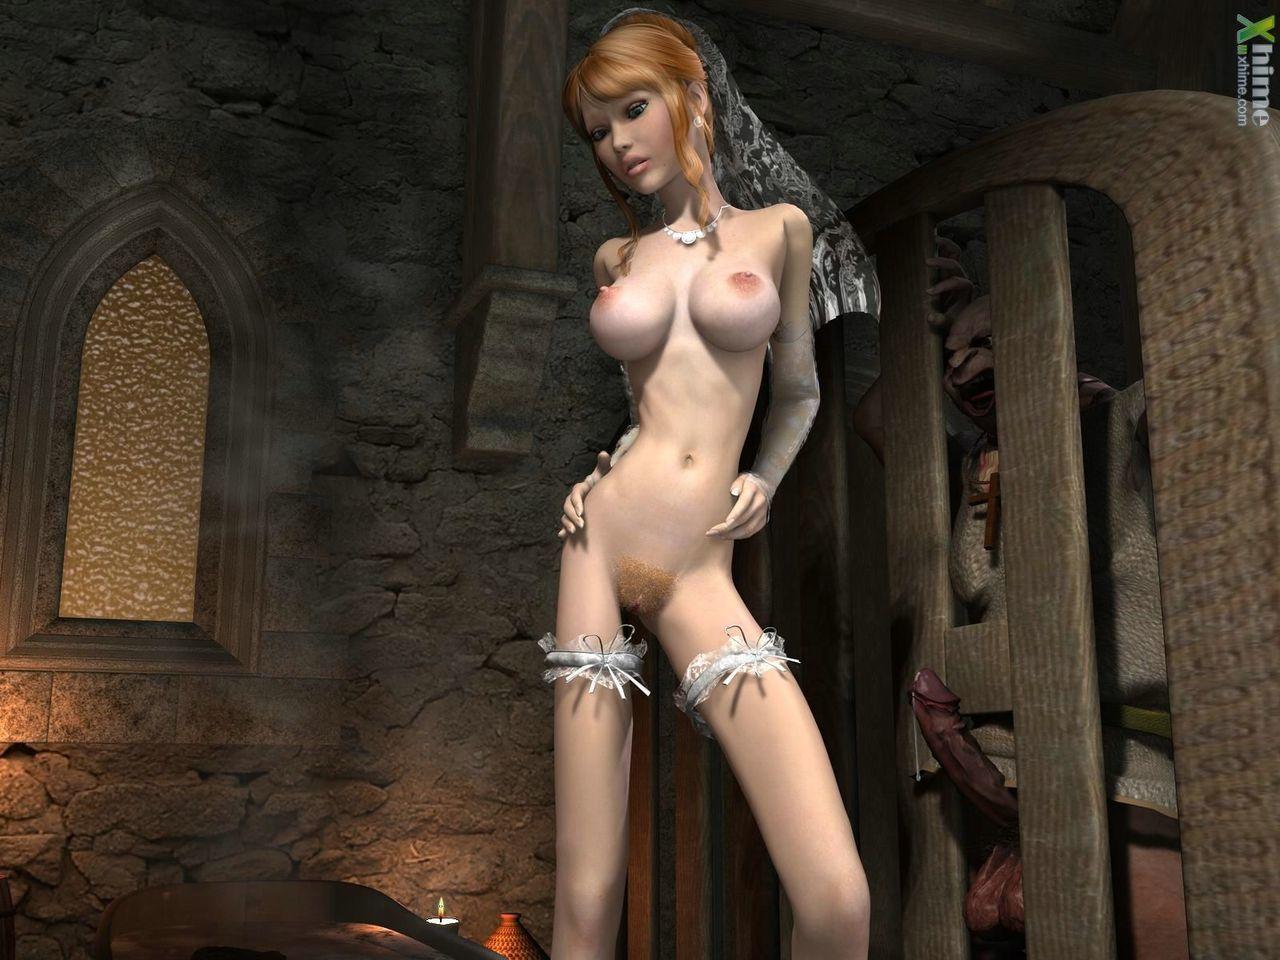 fantasy cg collection - part 9